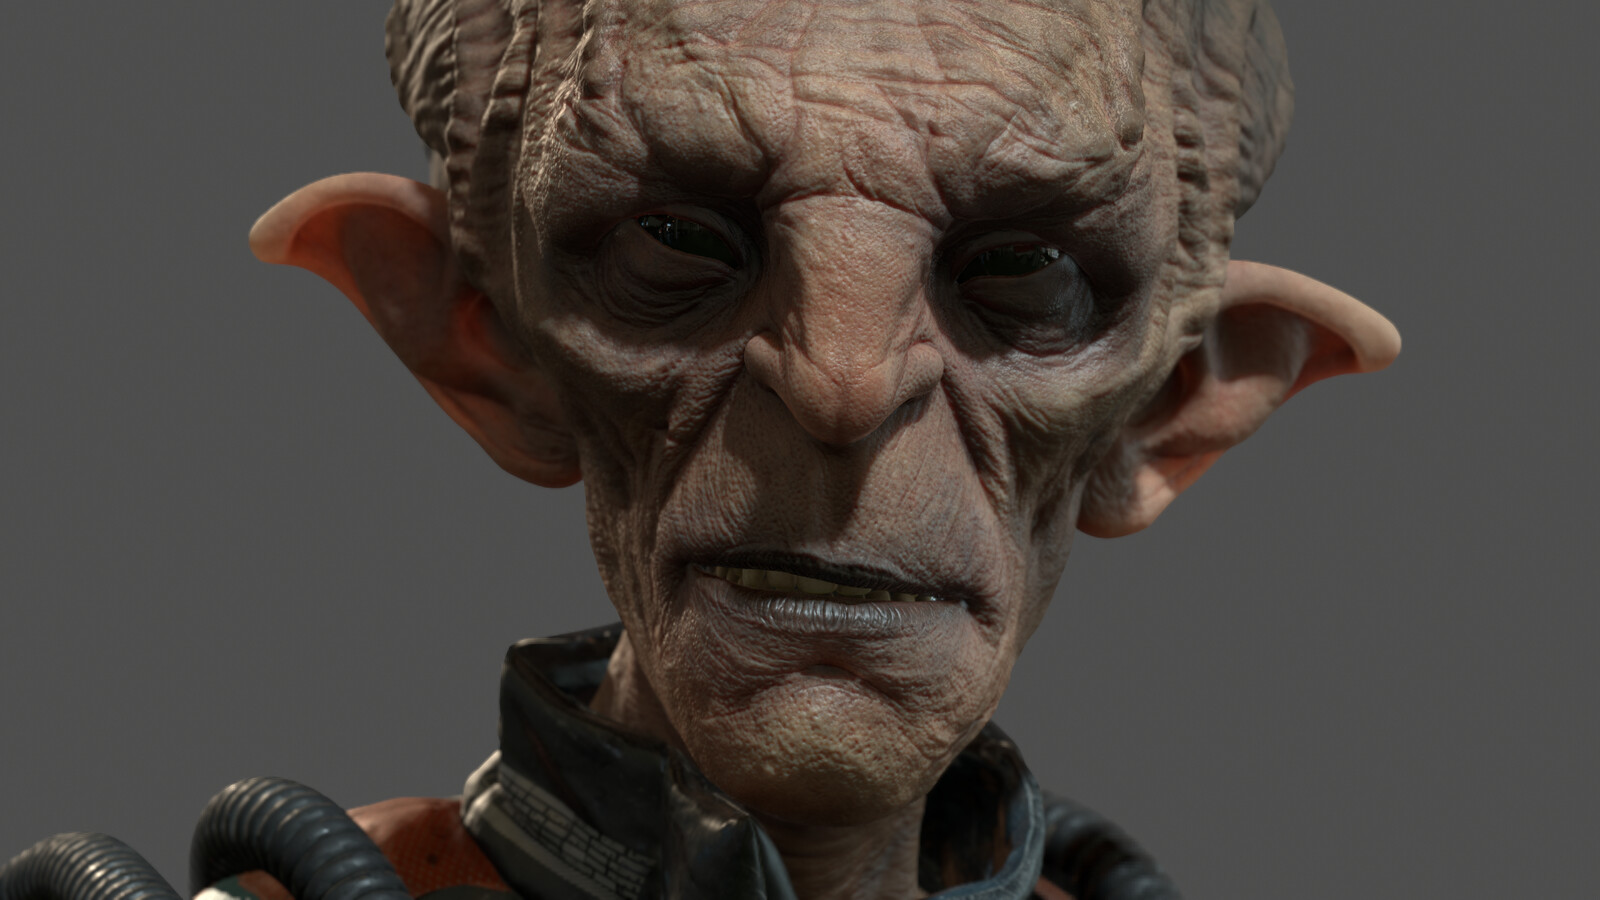 real-time render - head closeup